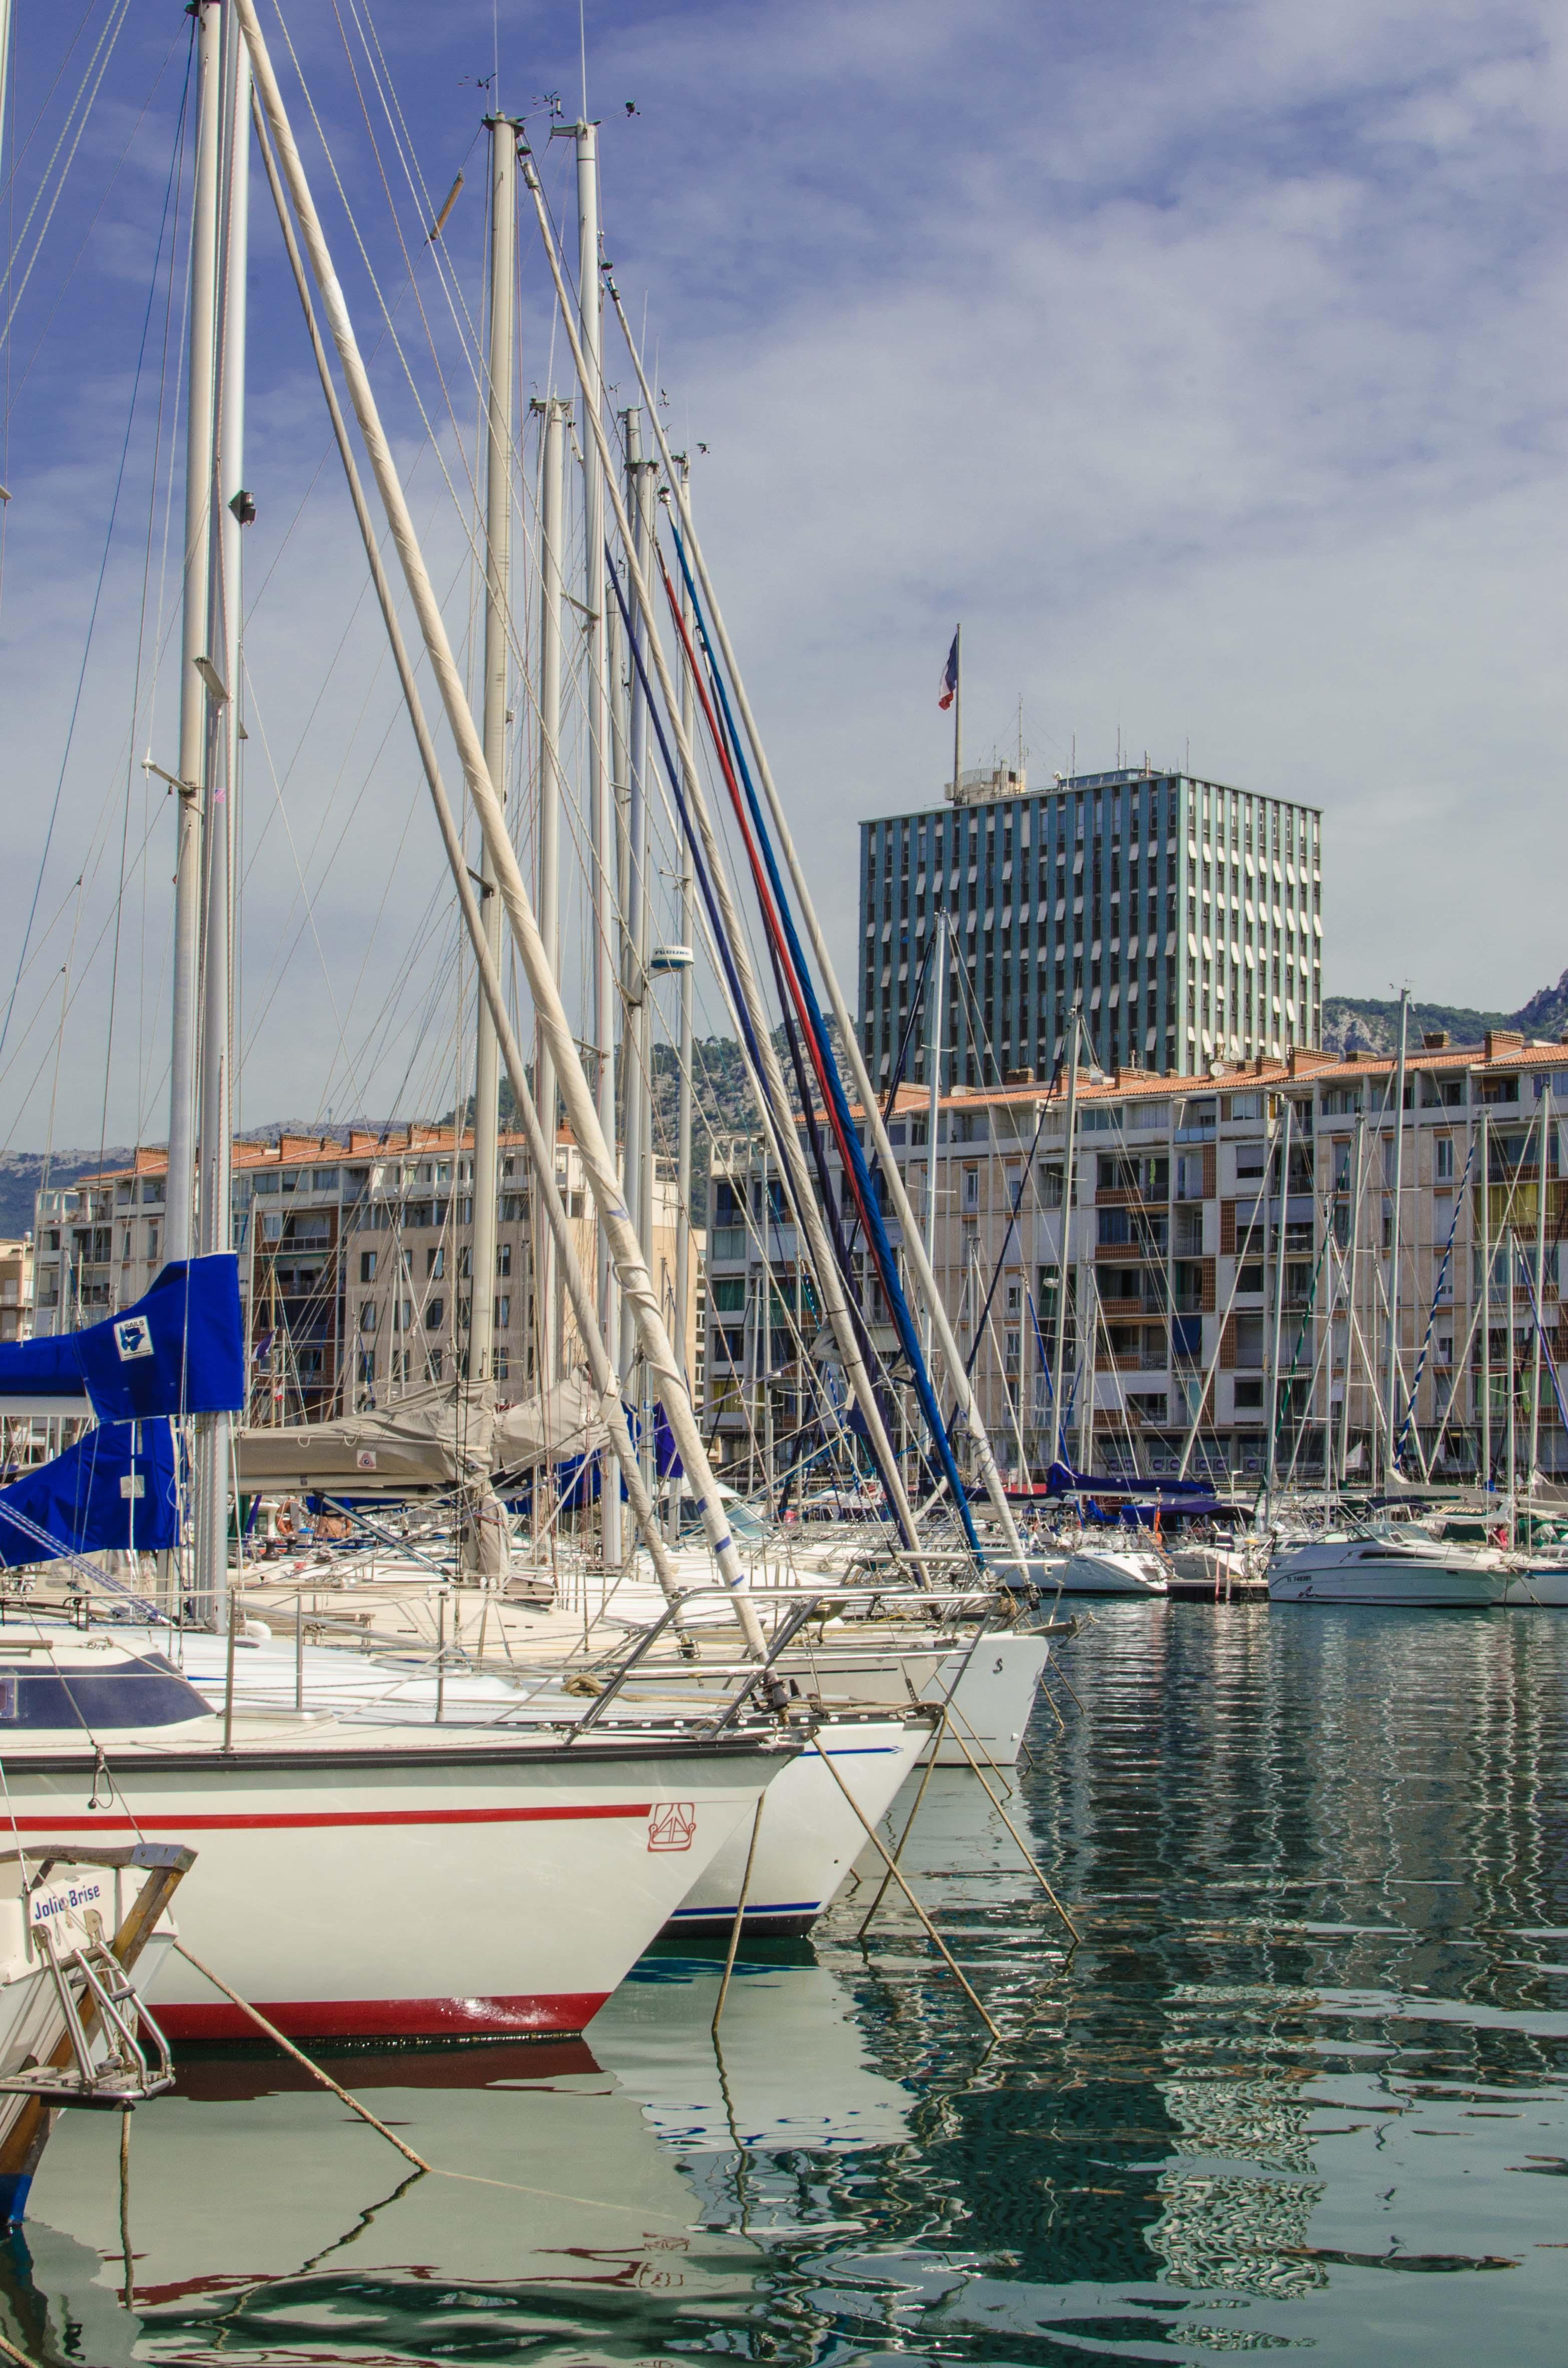 provenza42 Vacanze in Provenza, Camargue e Costa Azzurra